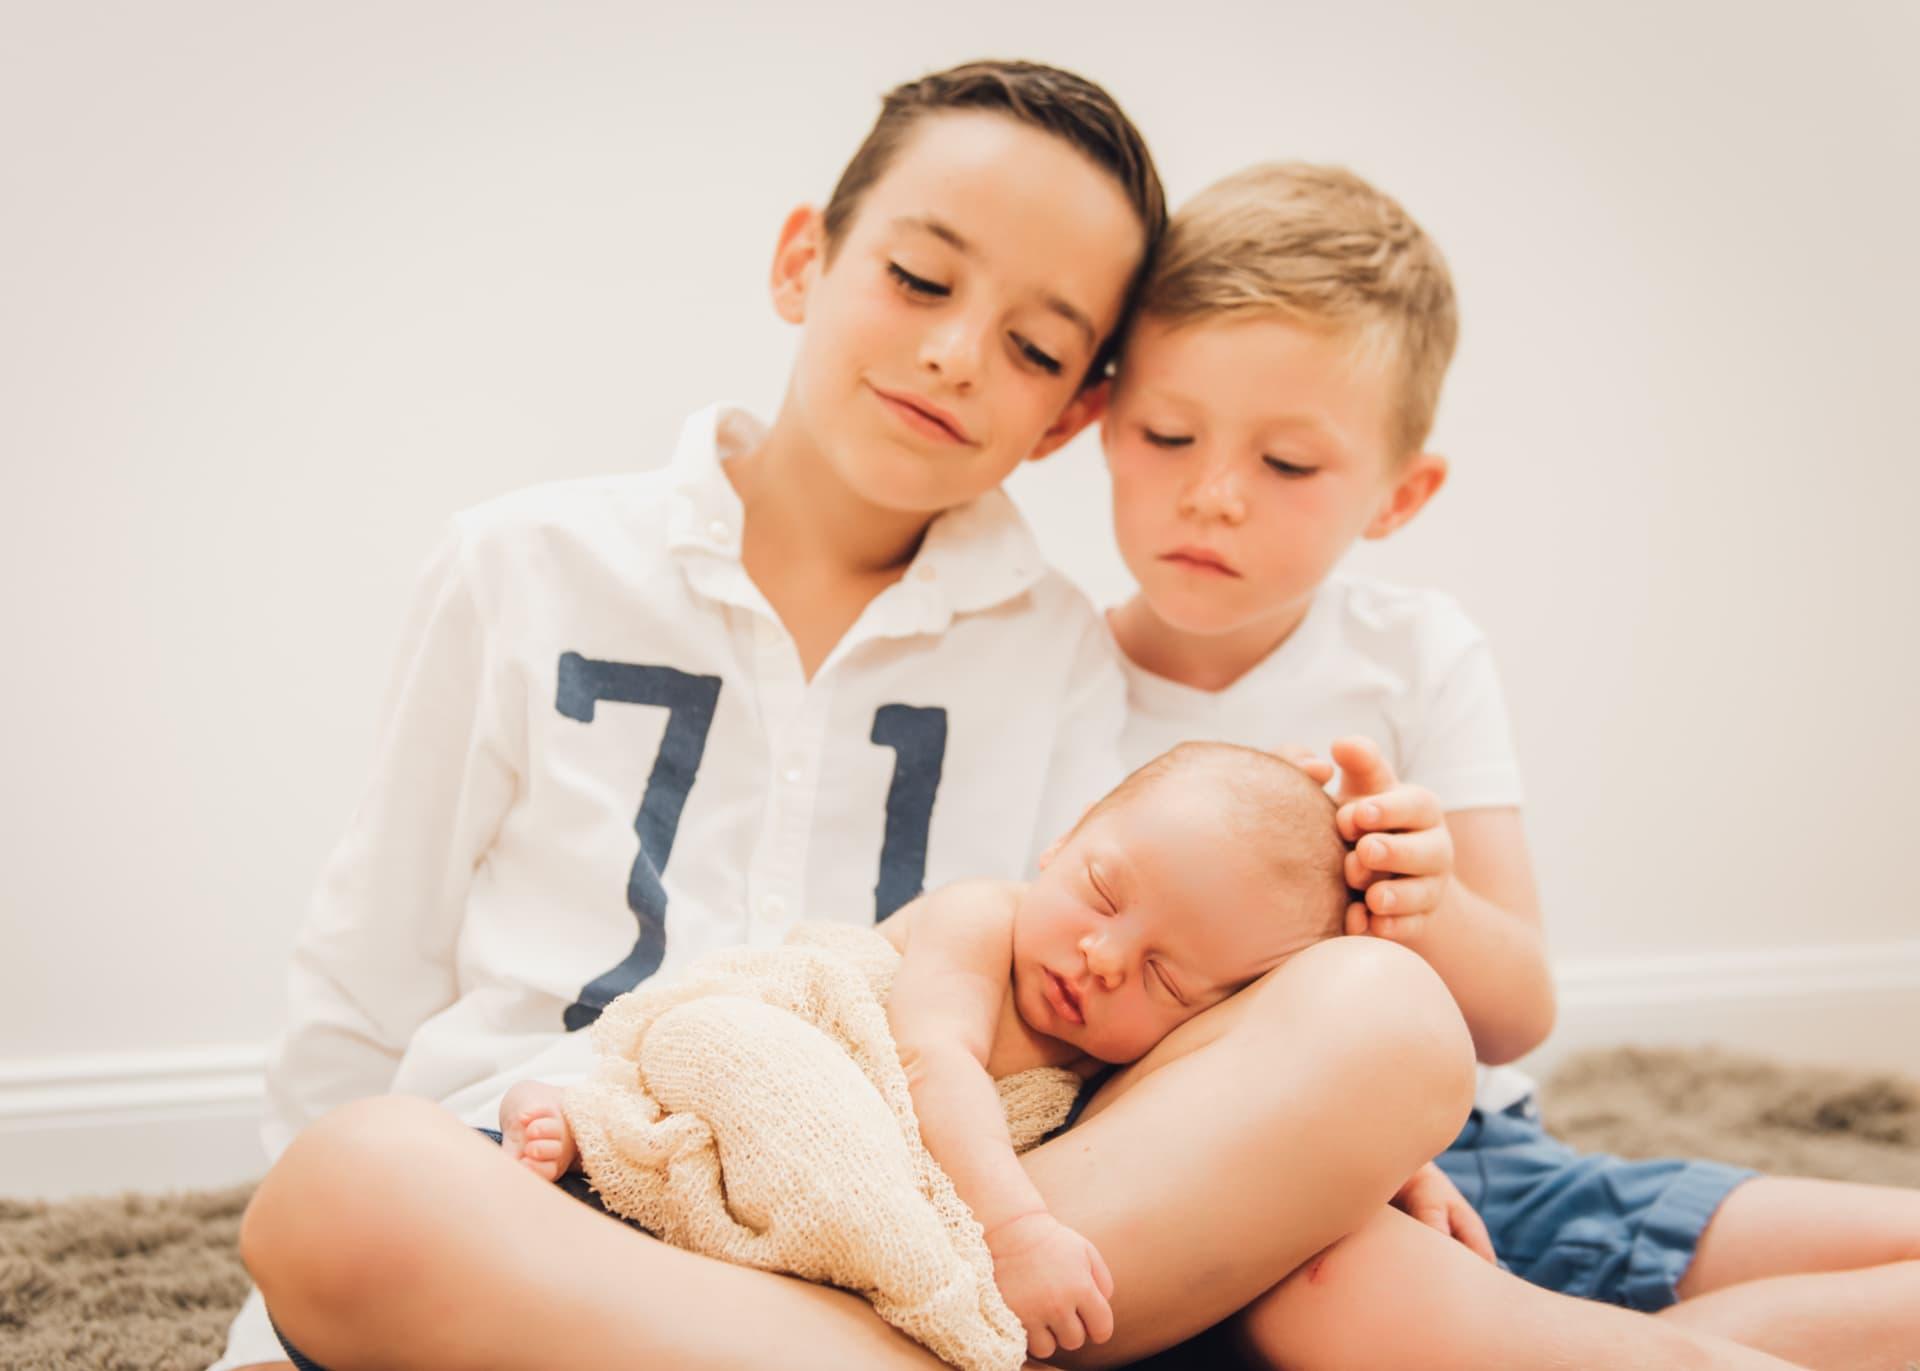 Familienfotografie  Familienfotos: Große Brüder